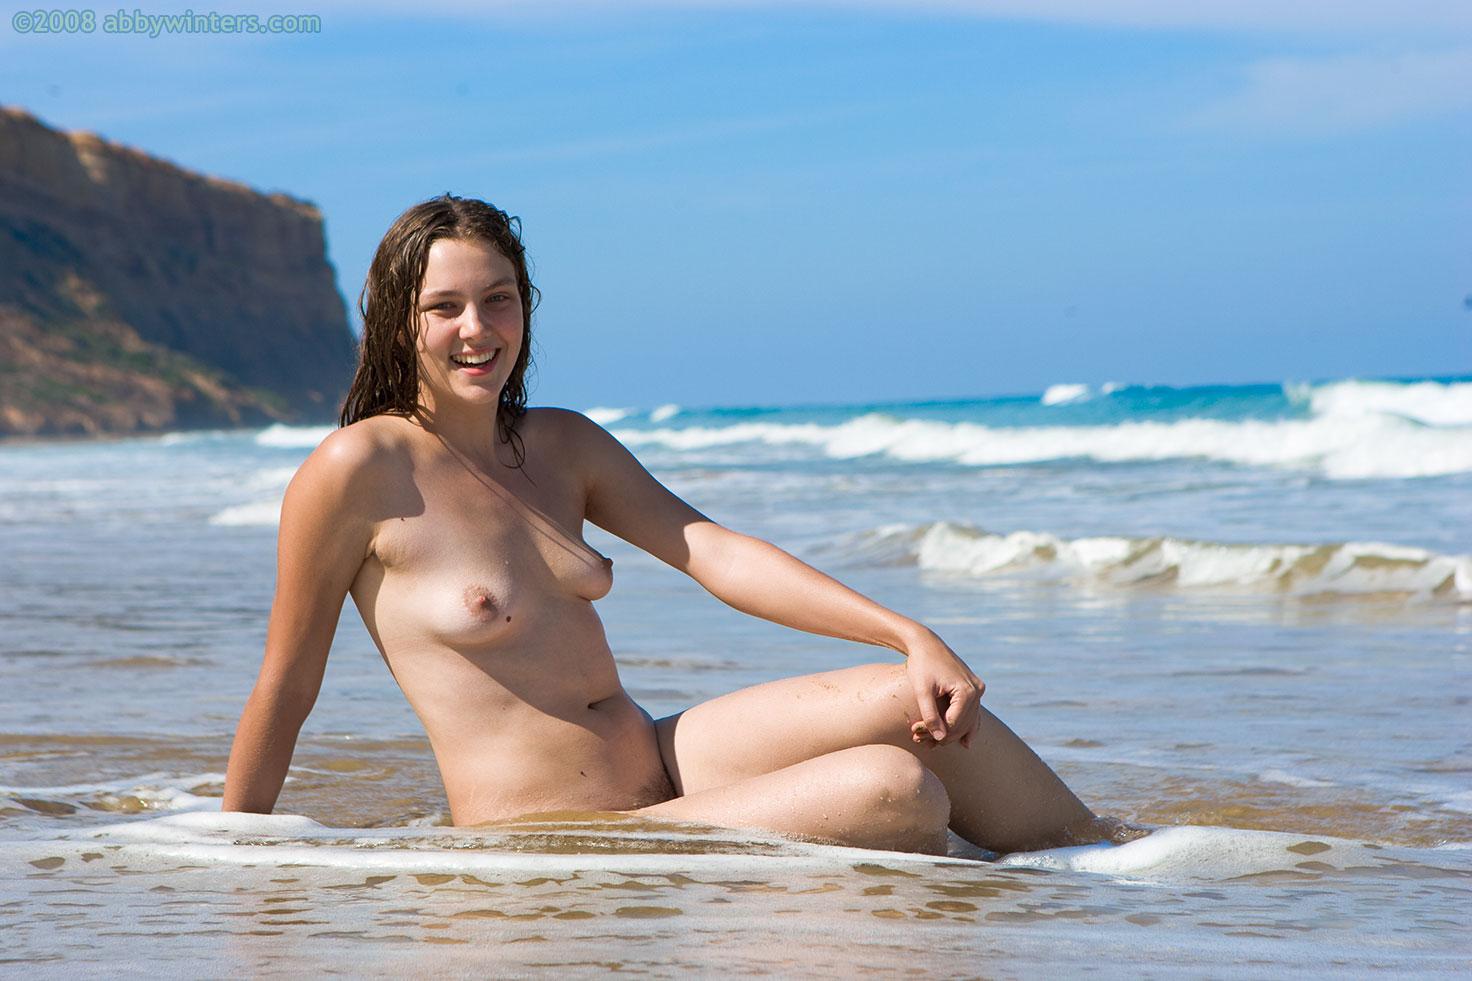 samie-krasivie-nudistki-na-more